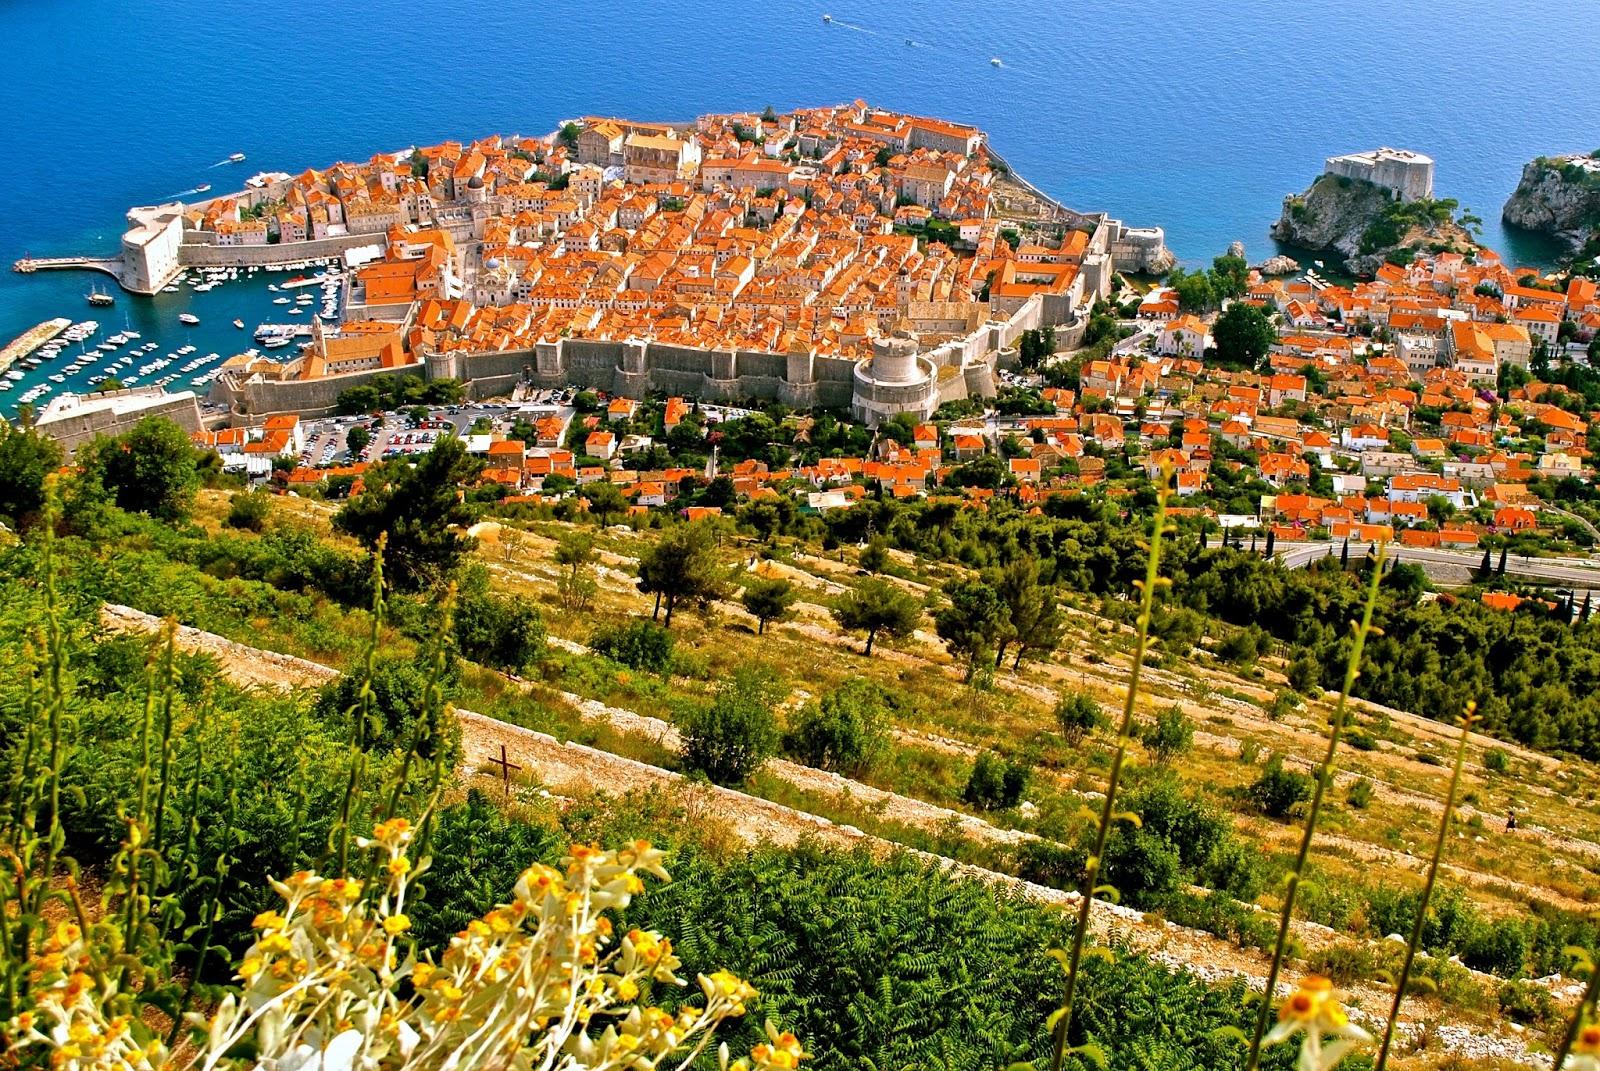 View of Dubrovnik from Mount Srdj